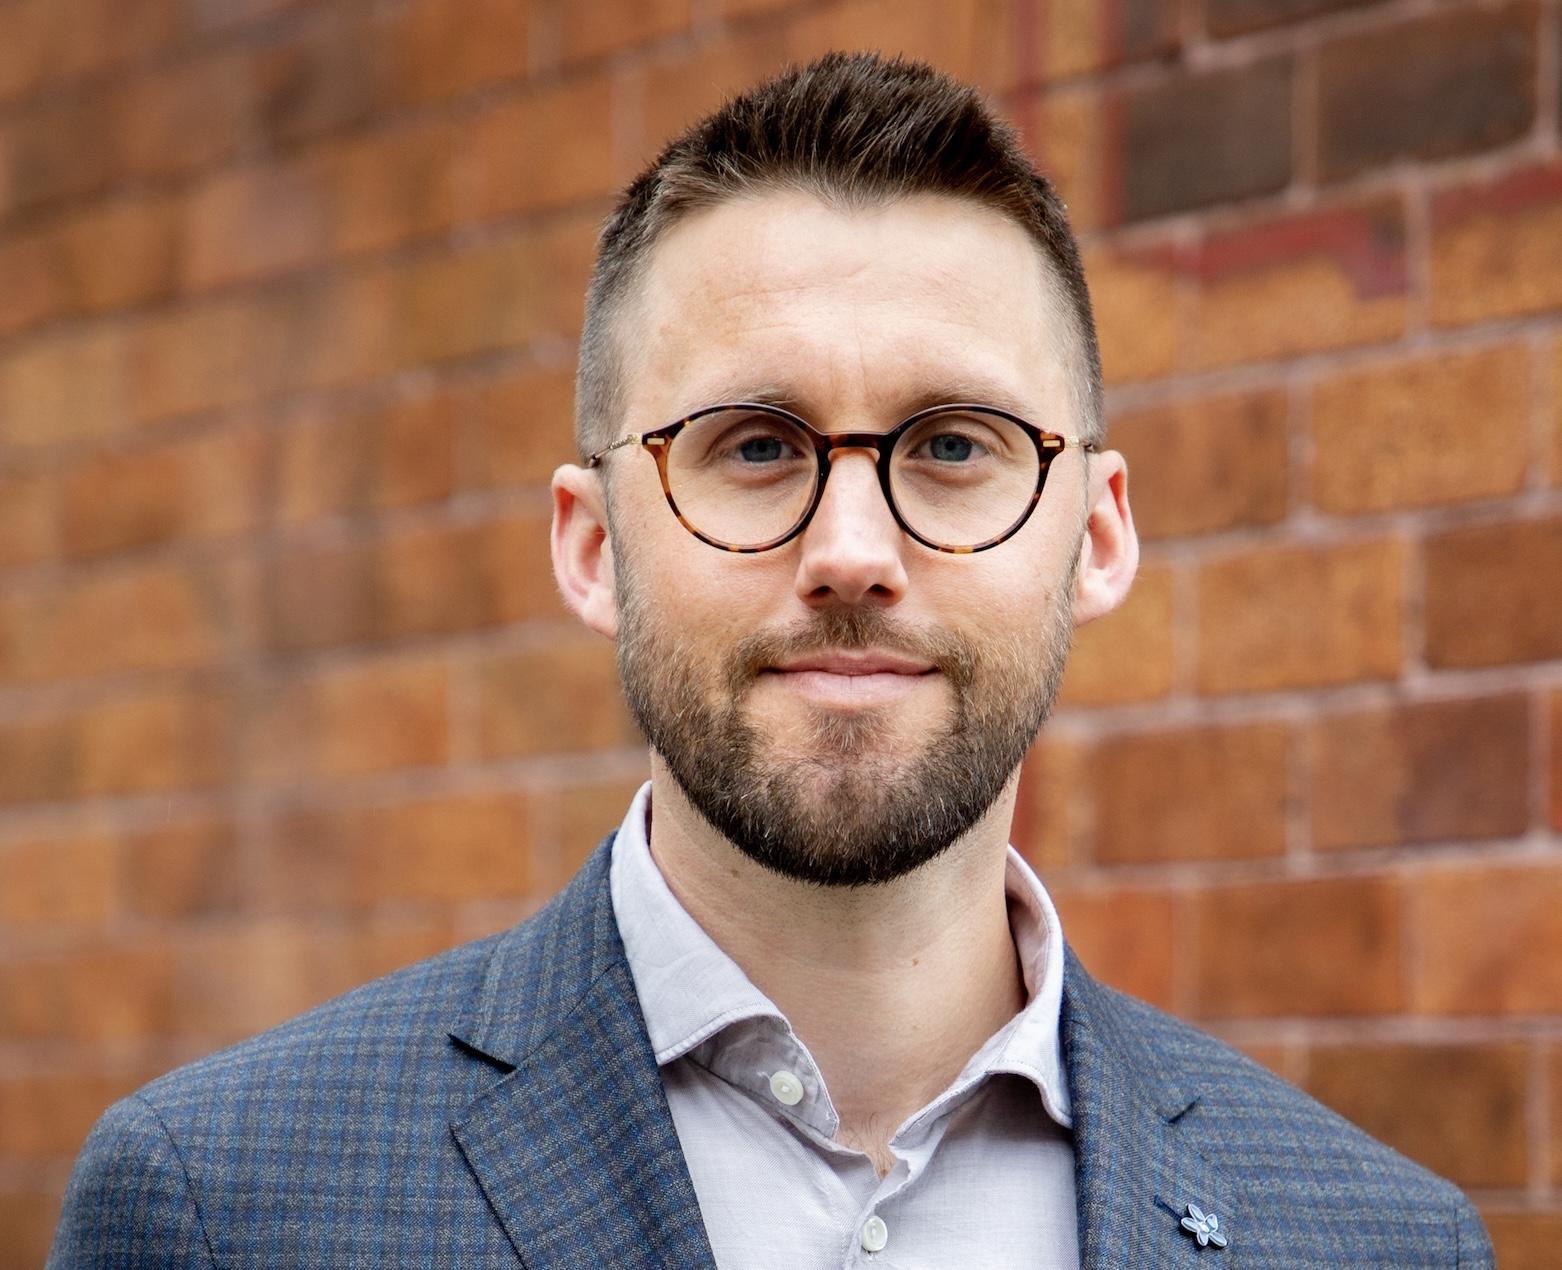 Porter Novelli appoints Brad Pogson to managing director position